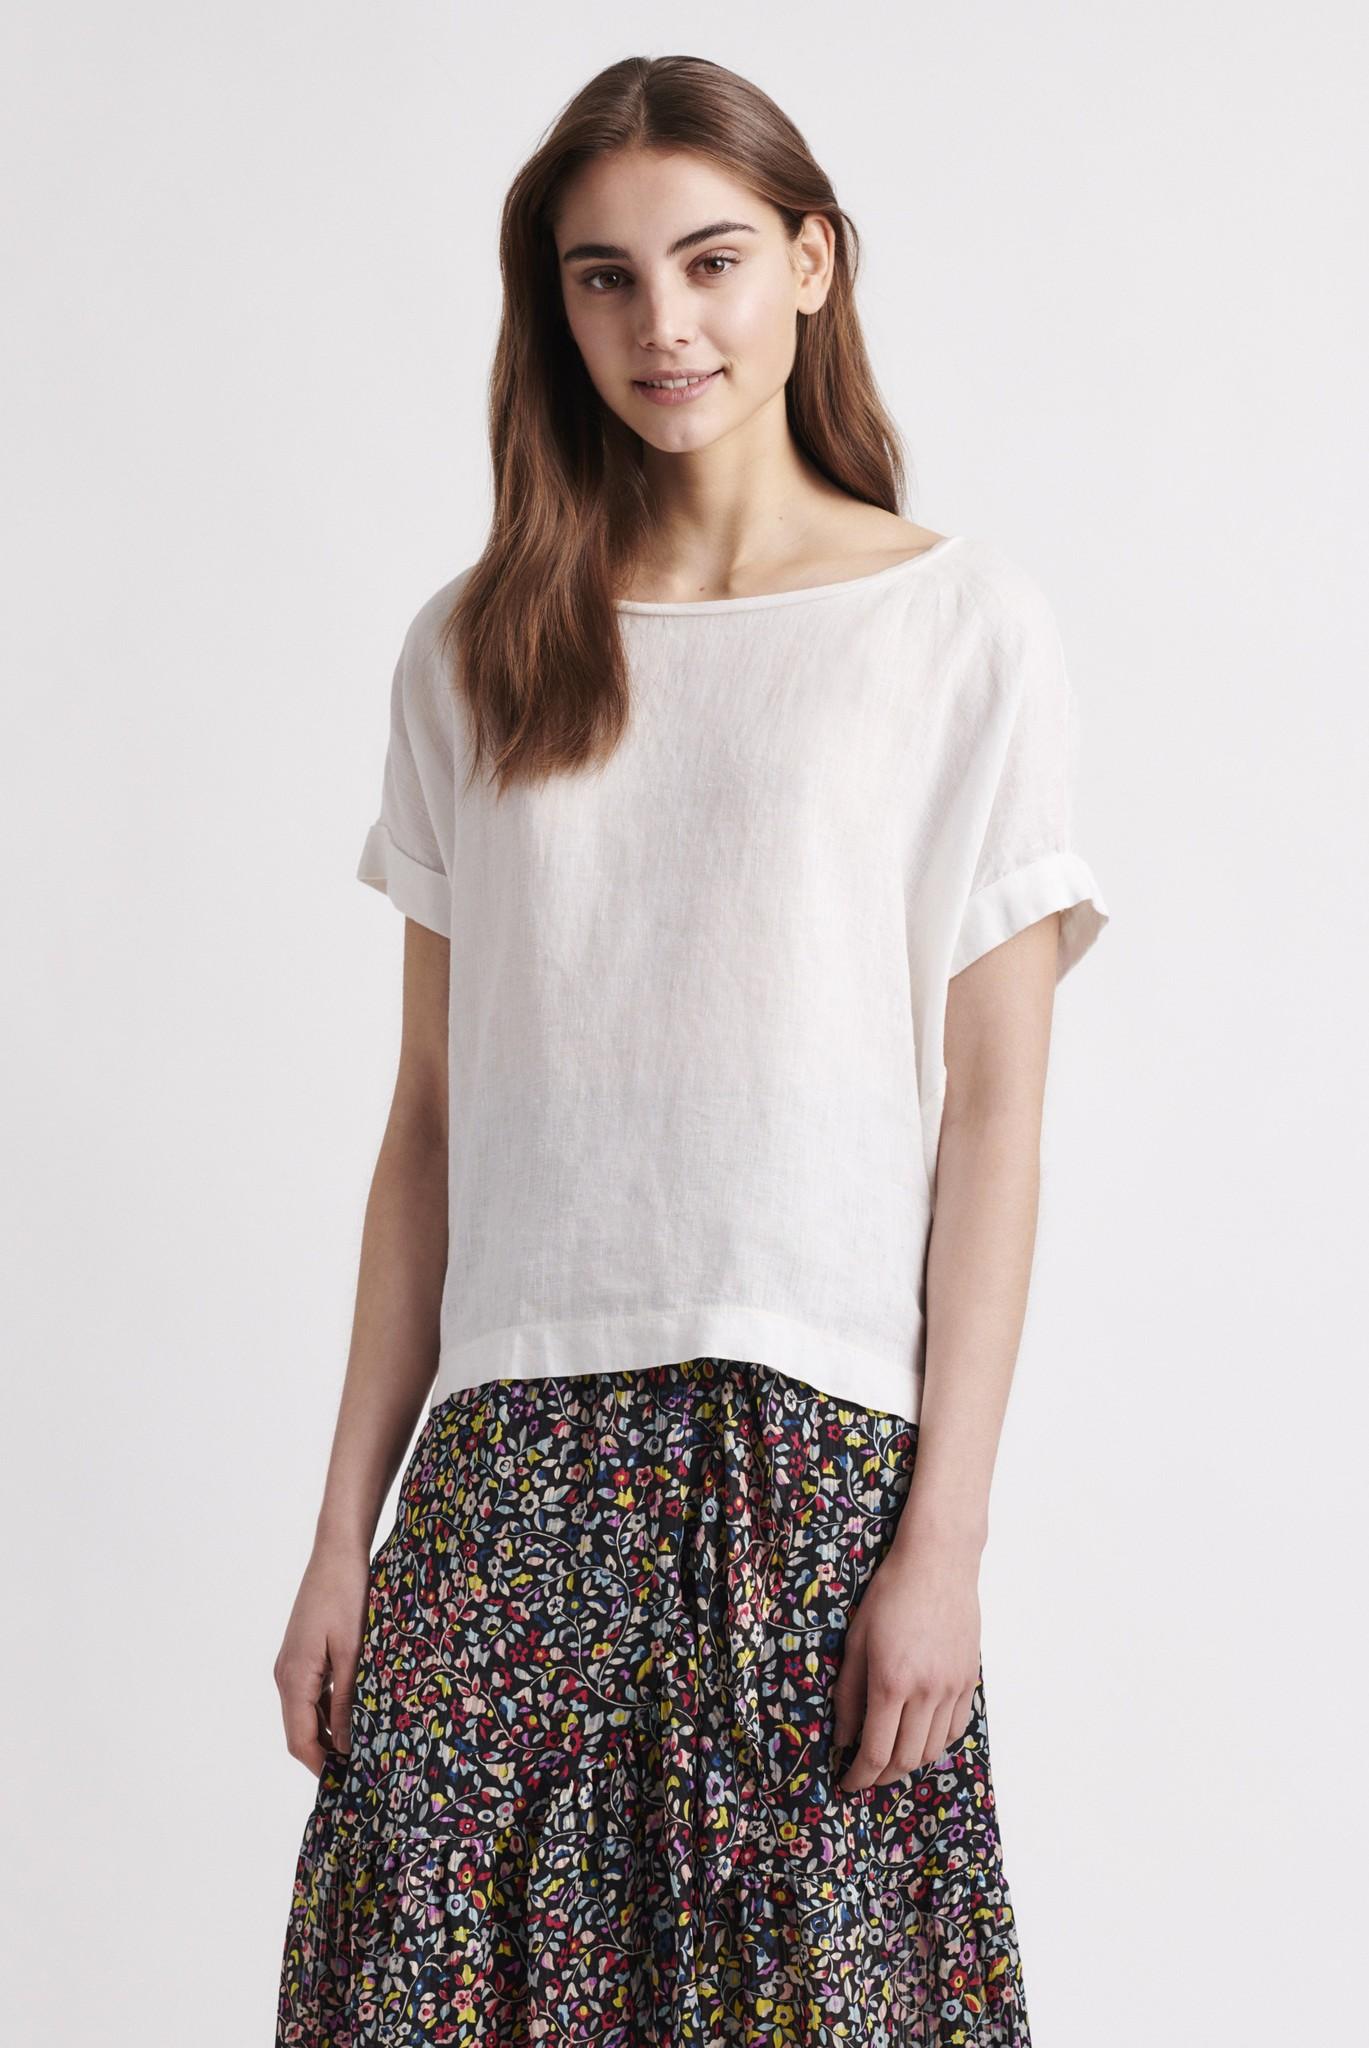 RAMIE - Свободная льняная футболка